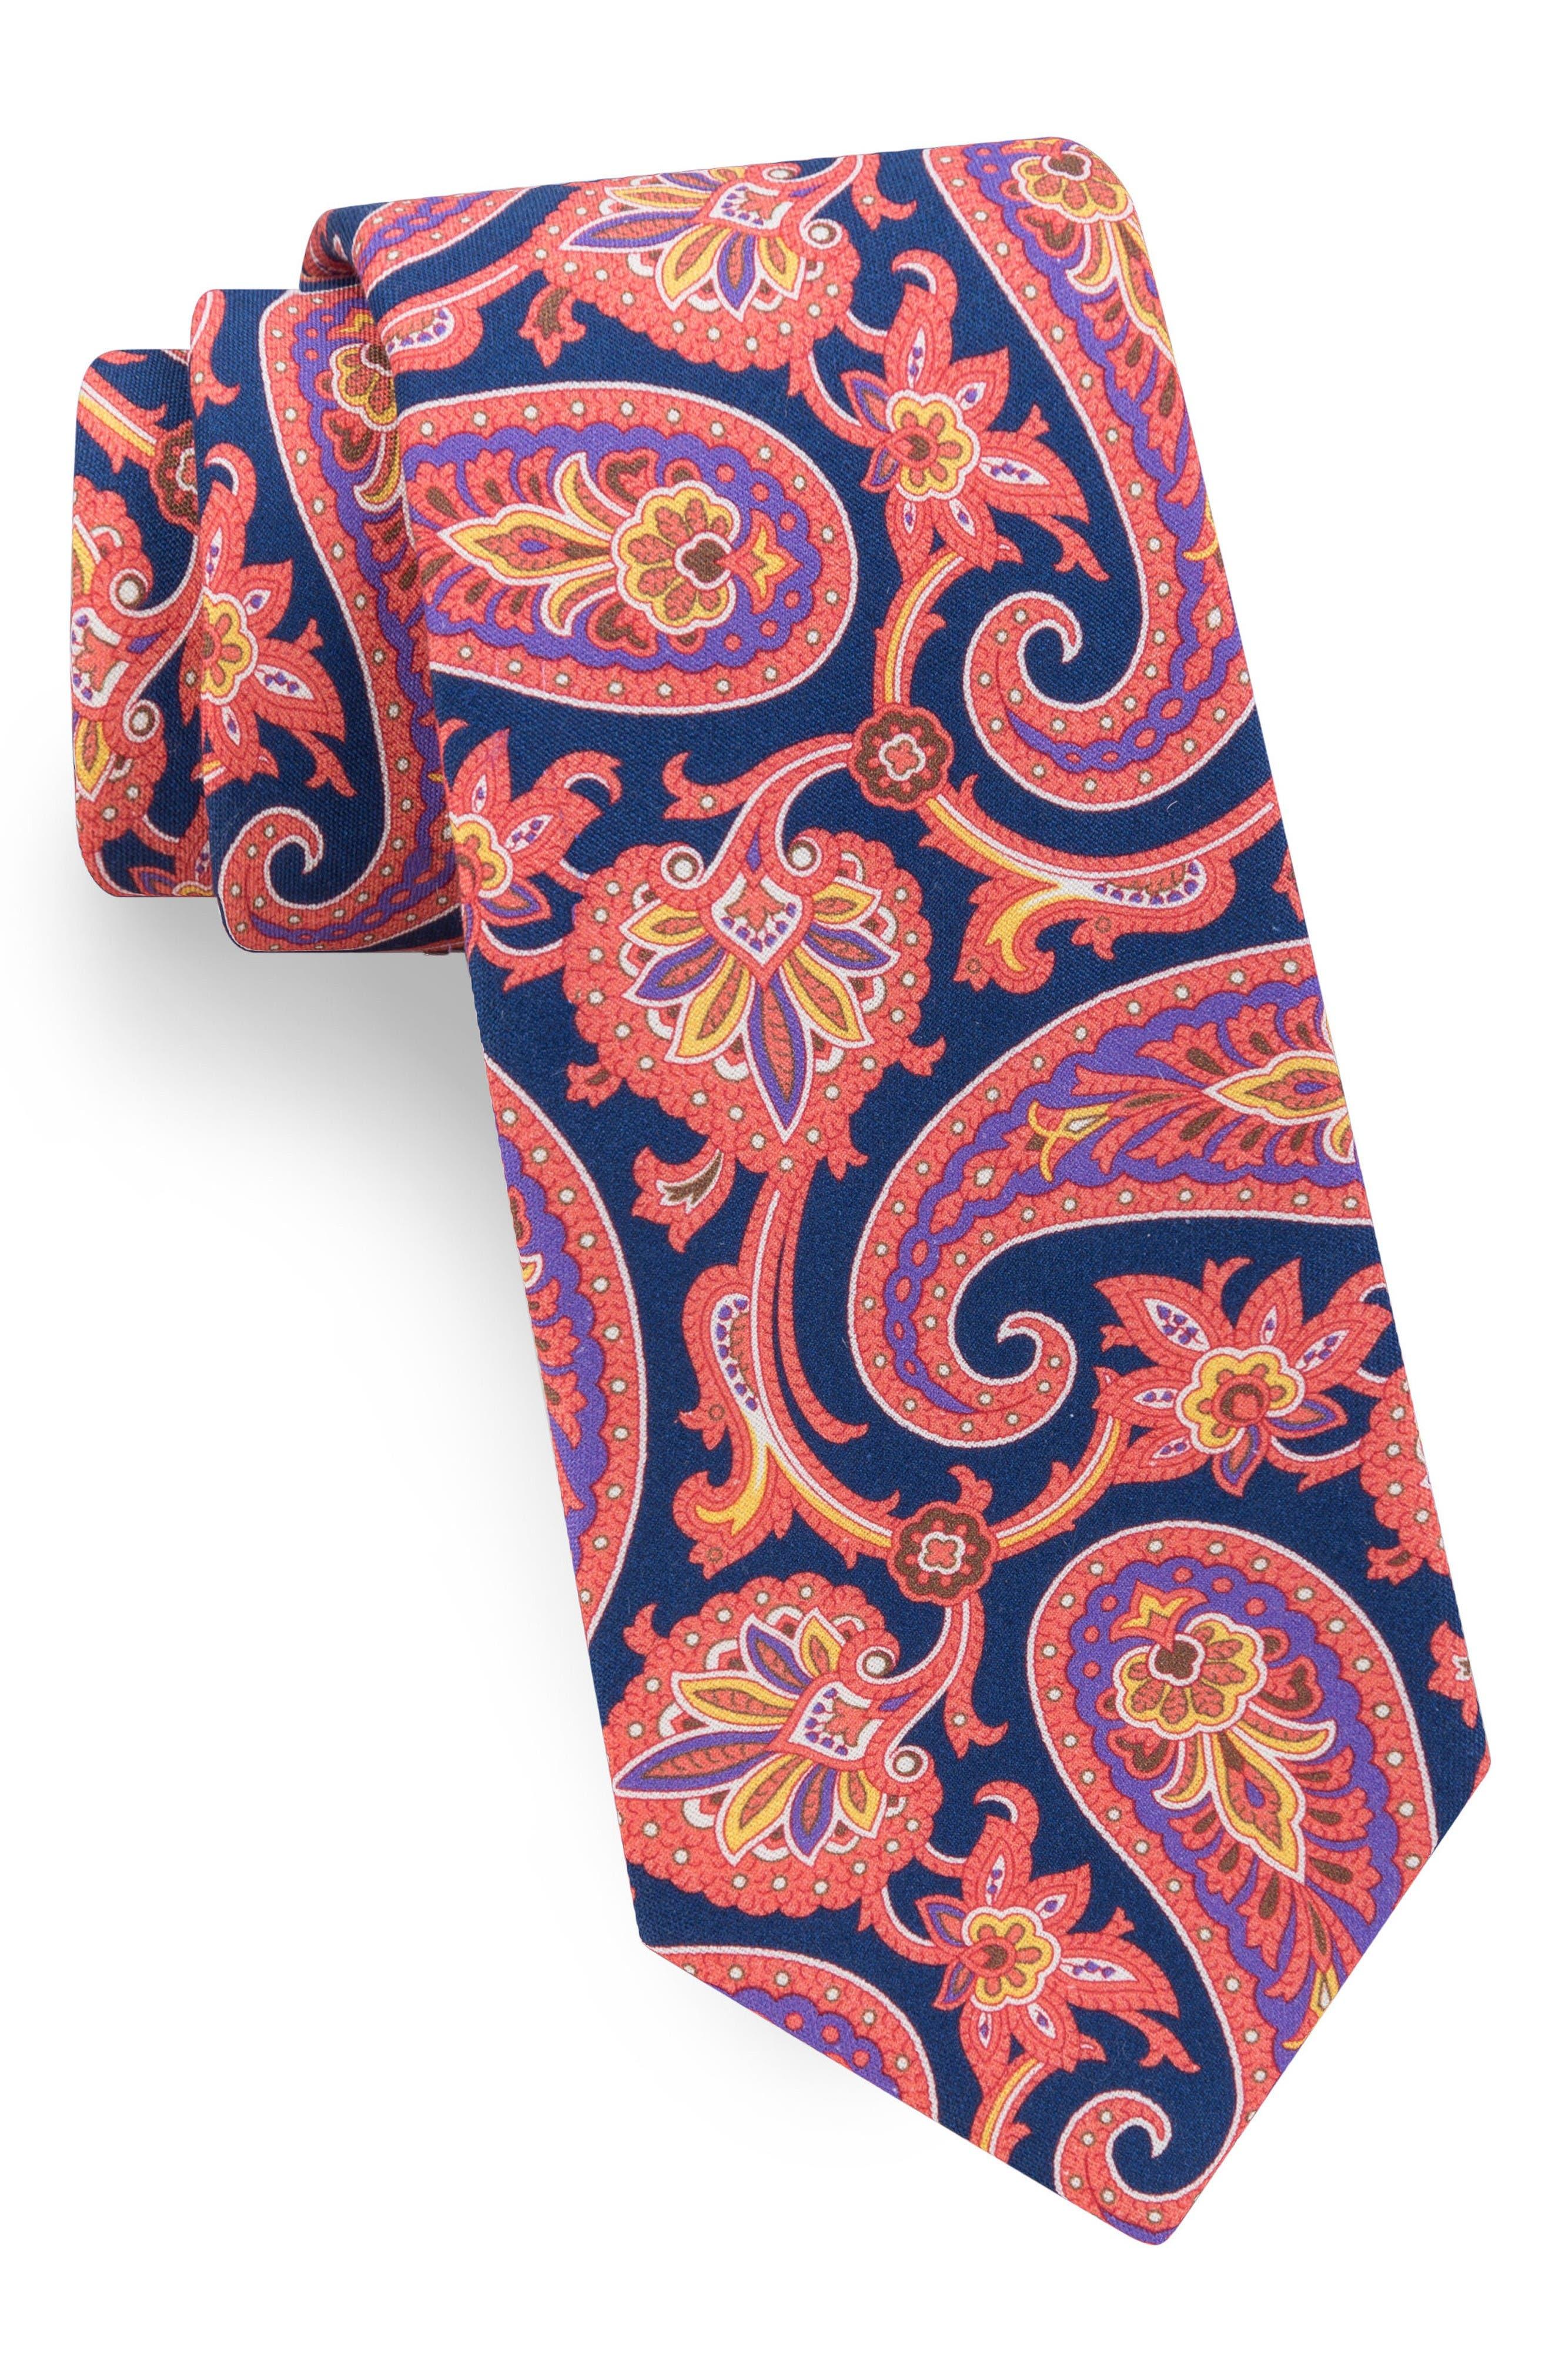 Hoxton Paisley Silk Tie,                             Main thumbnail 1, color,                             Navy/ Orange